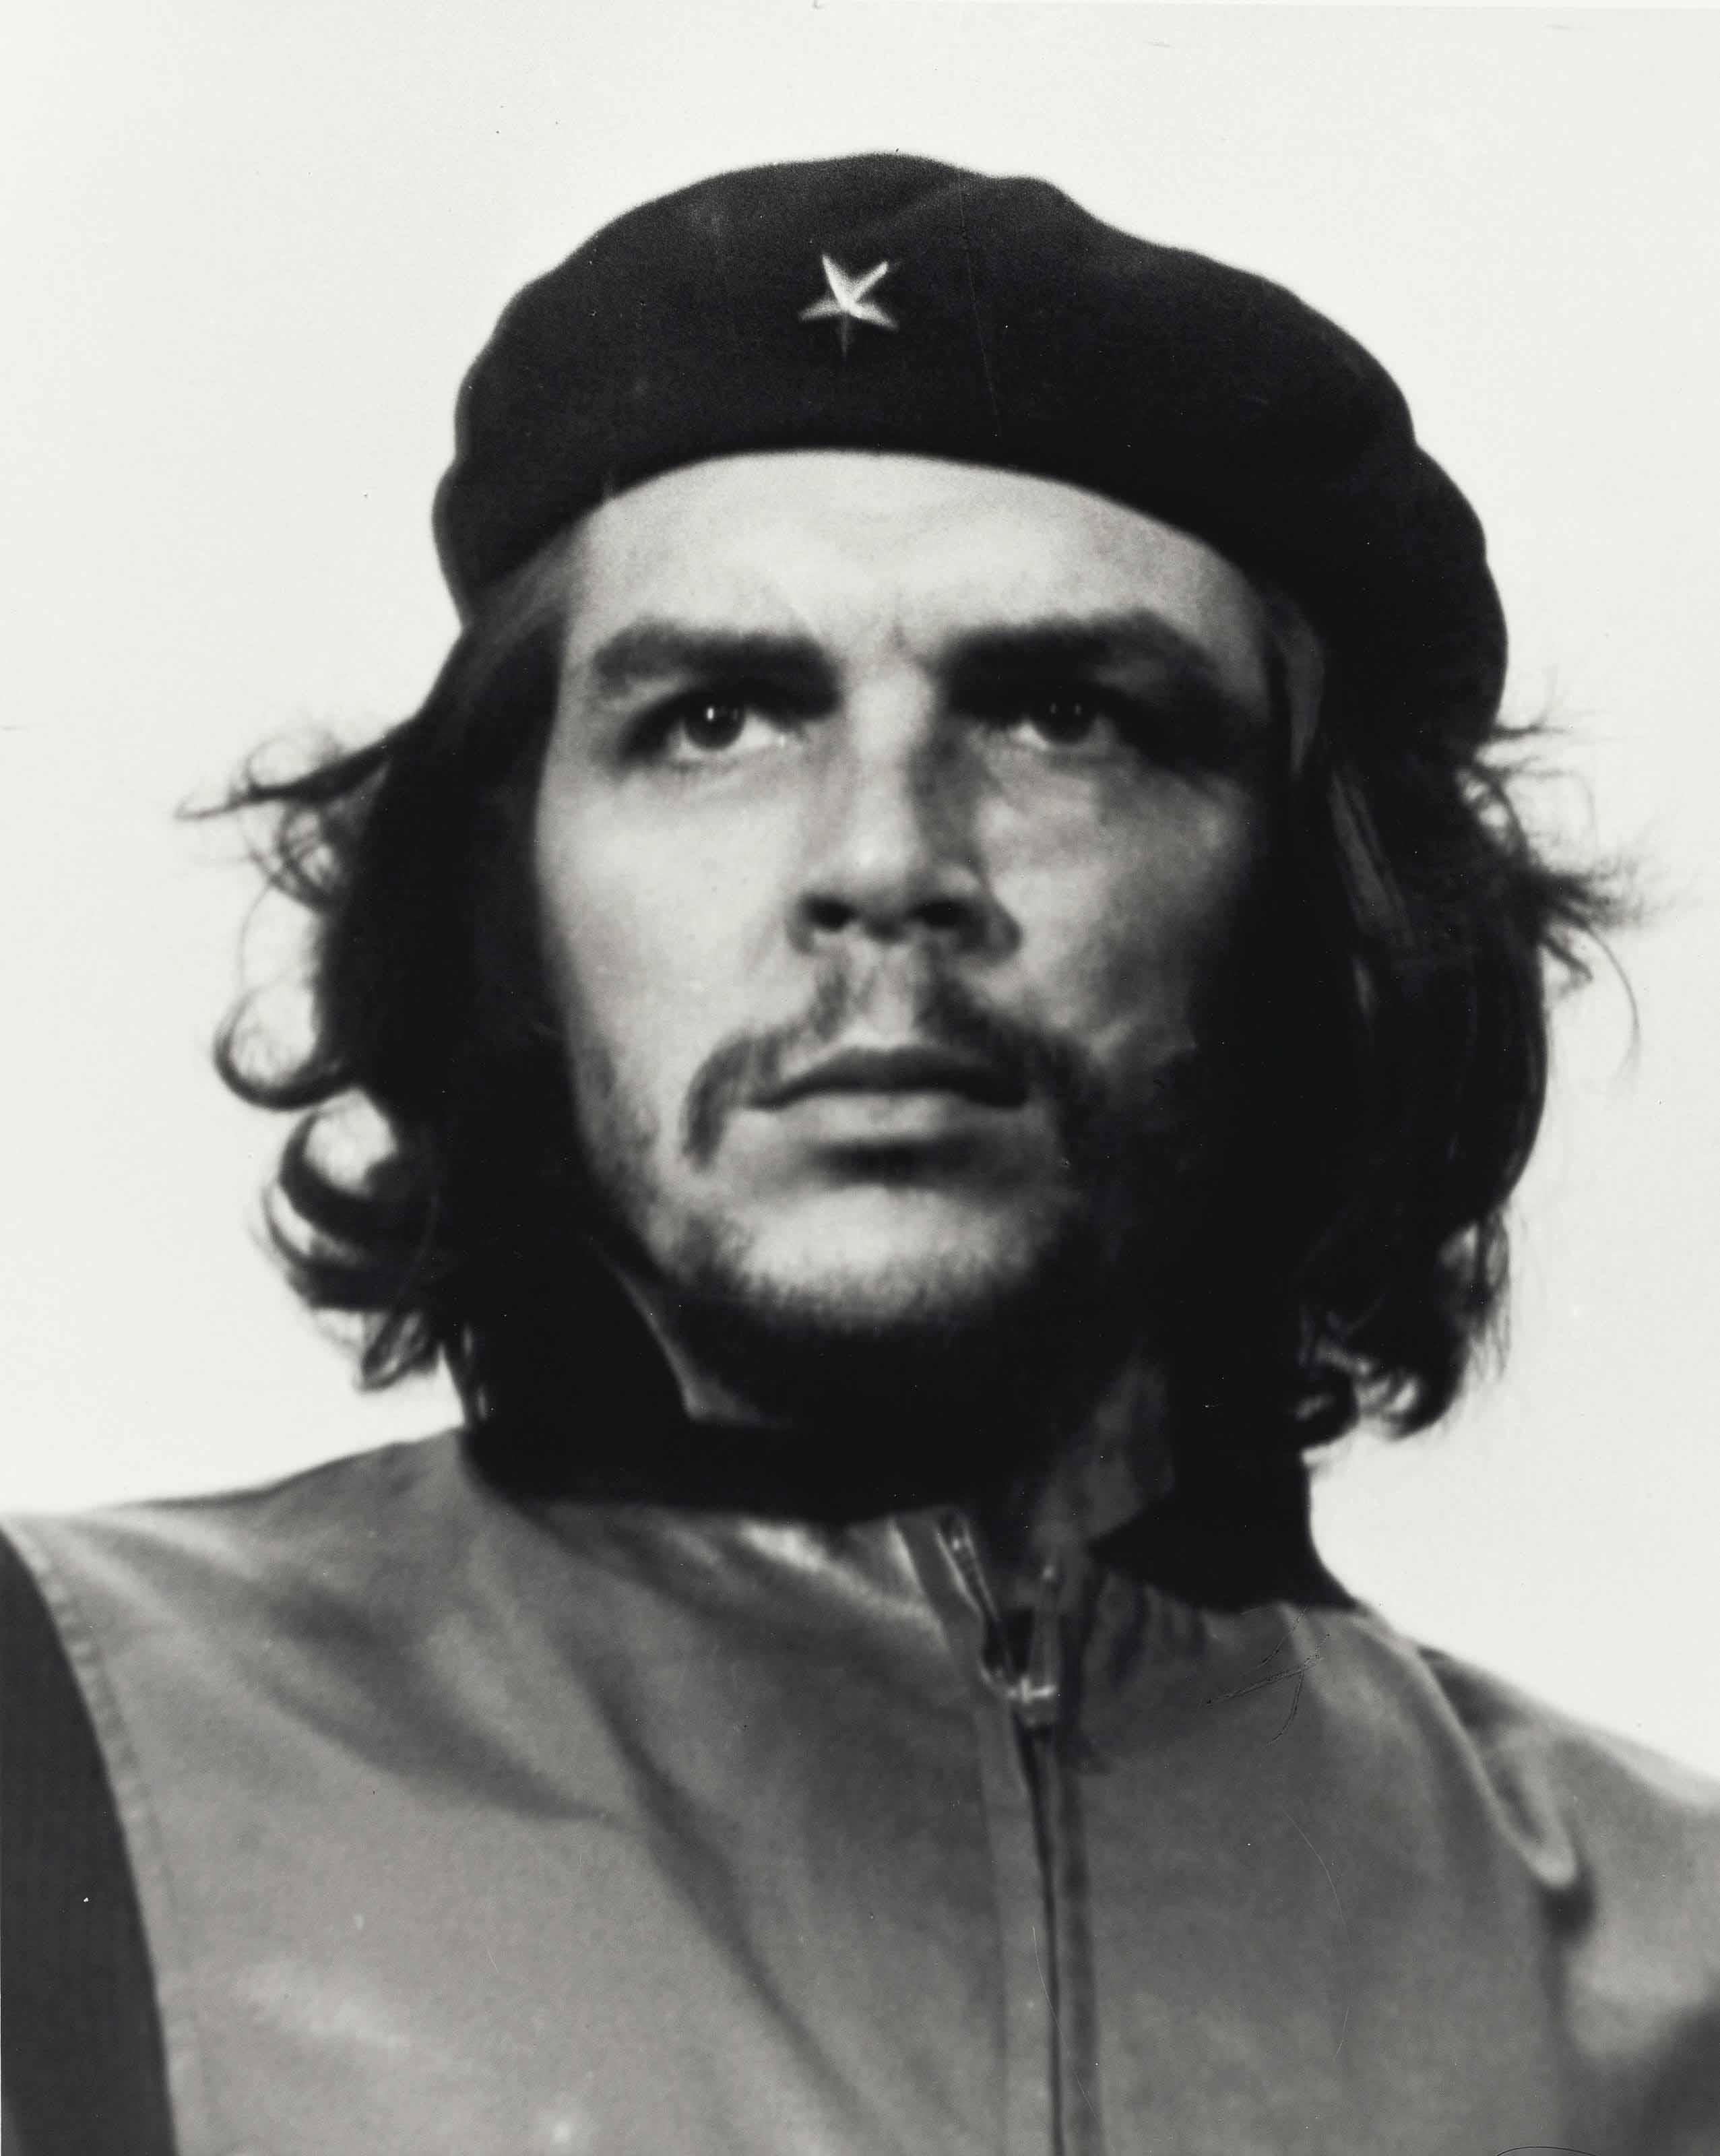 Guerrillero Heroico (Che Guevara), 5/30/1960